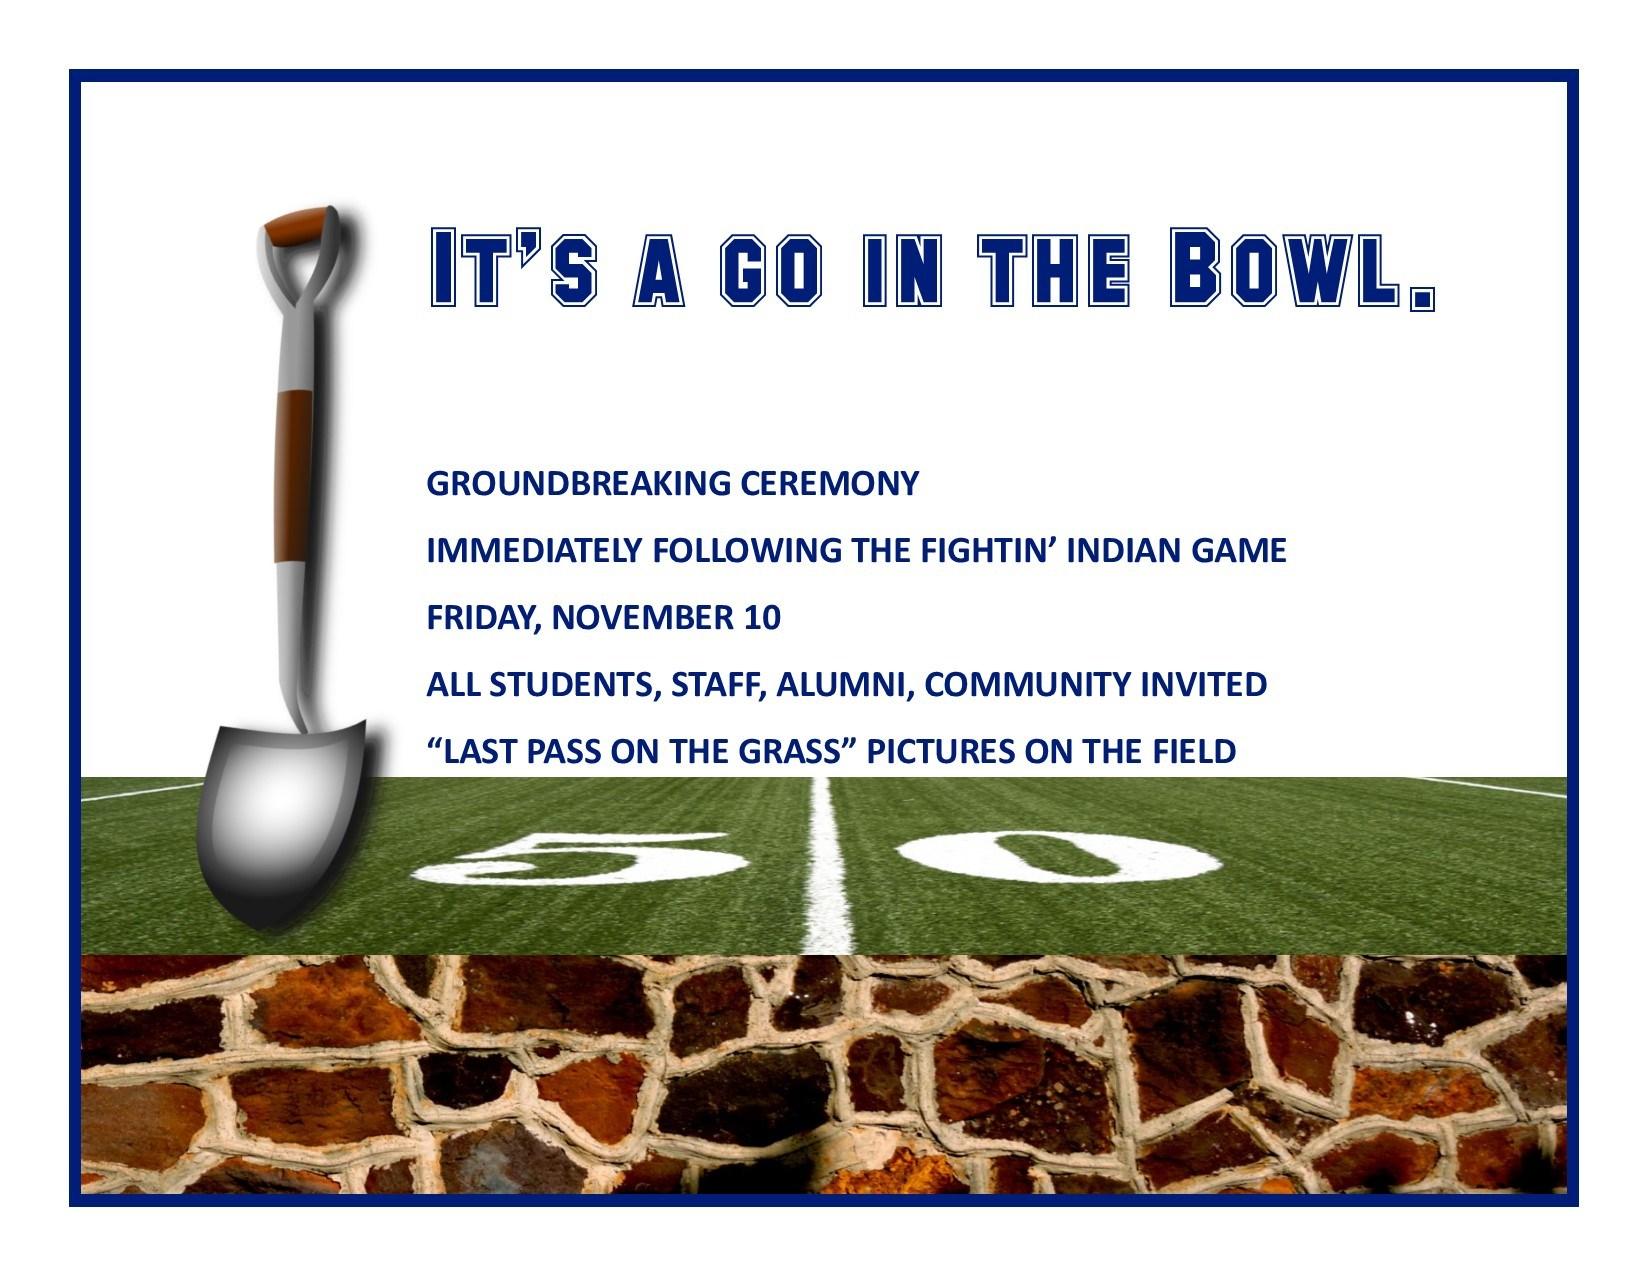 Groundbreaking Ceremony at Tomato Bowl Flyer